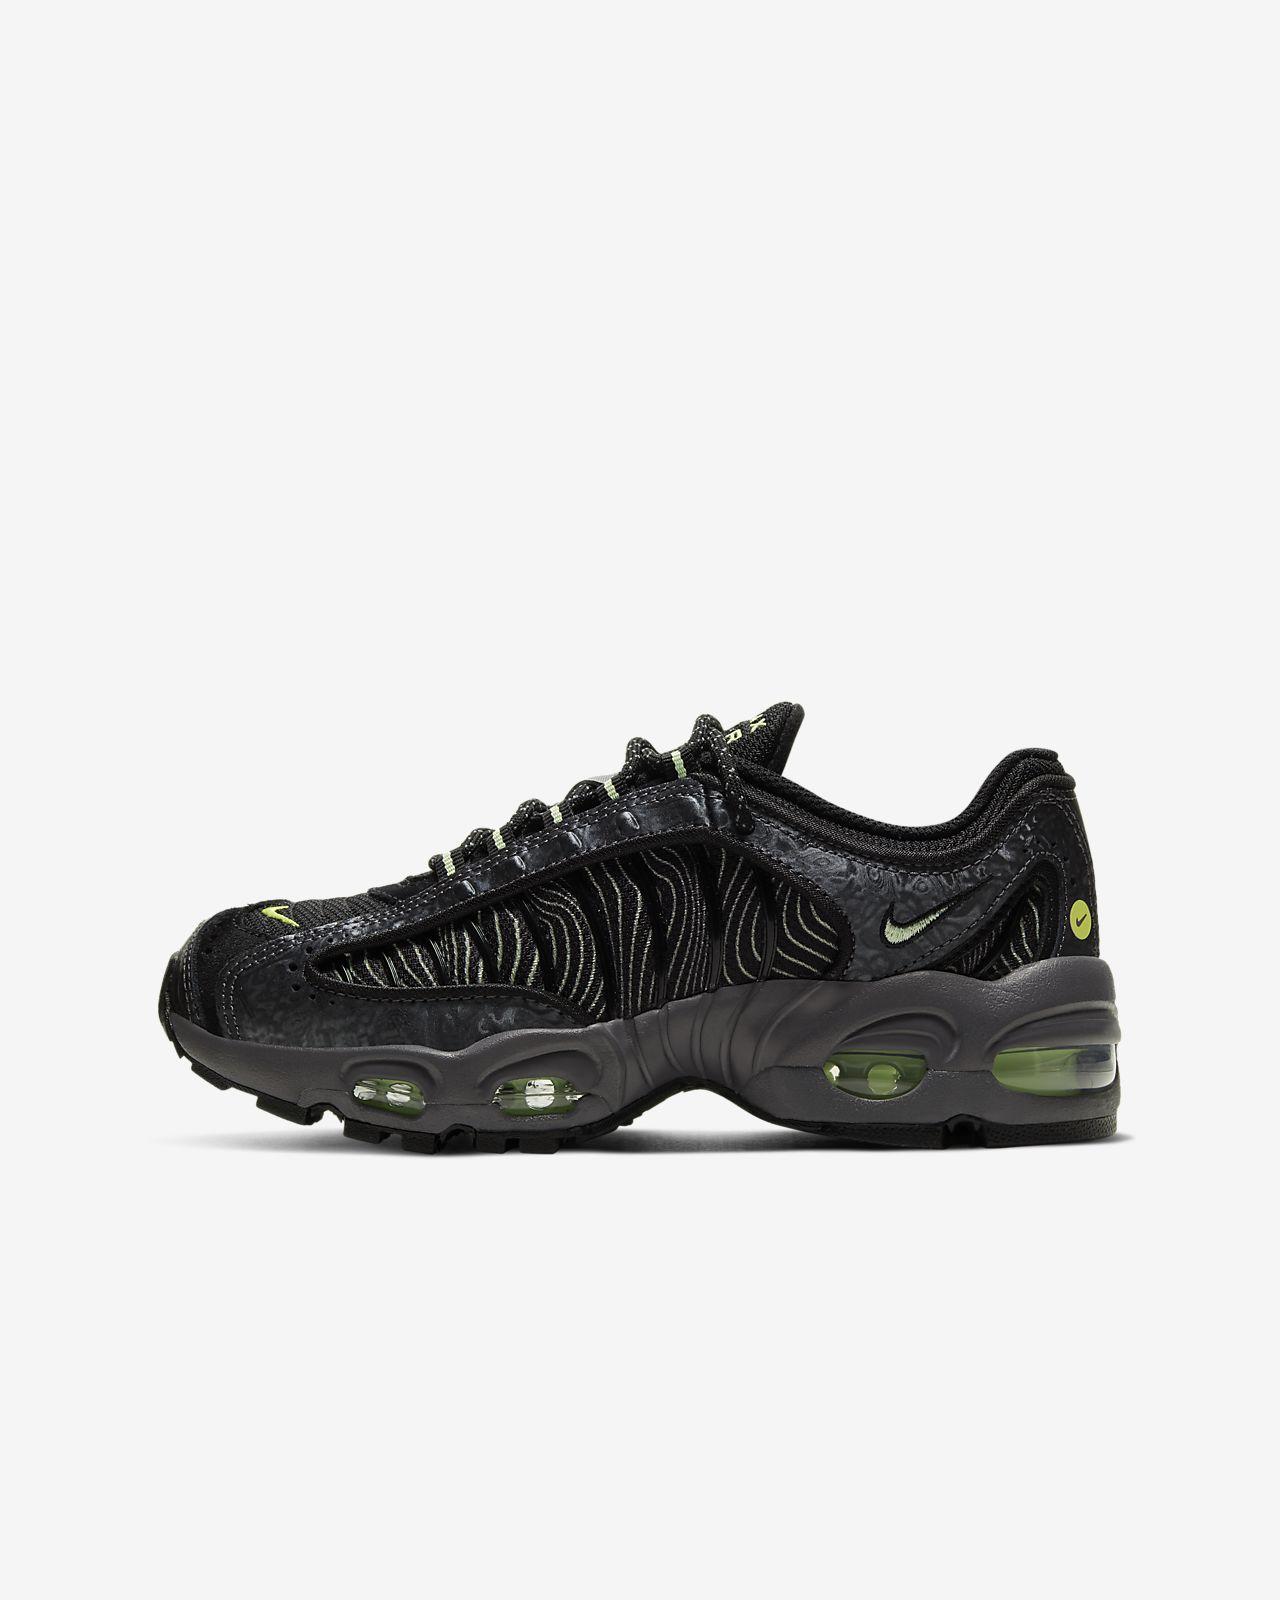 Nike Air Max Tailwind IV SE Older Kids' Shoe